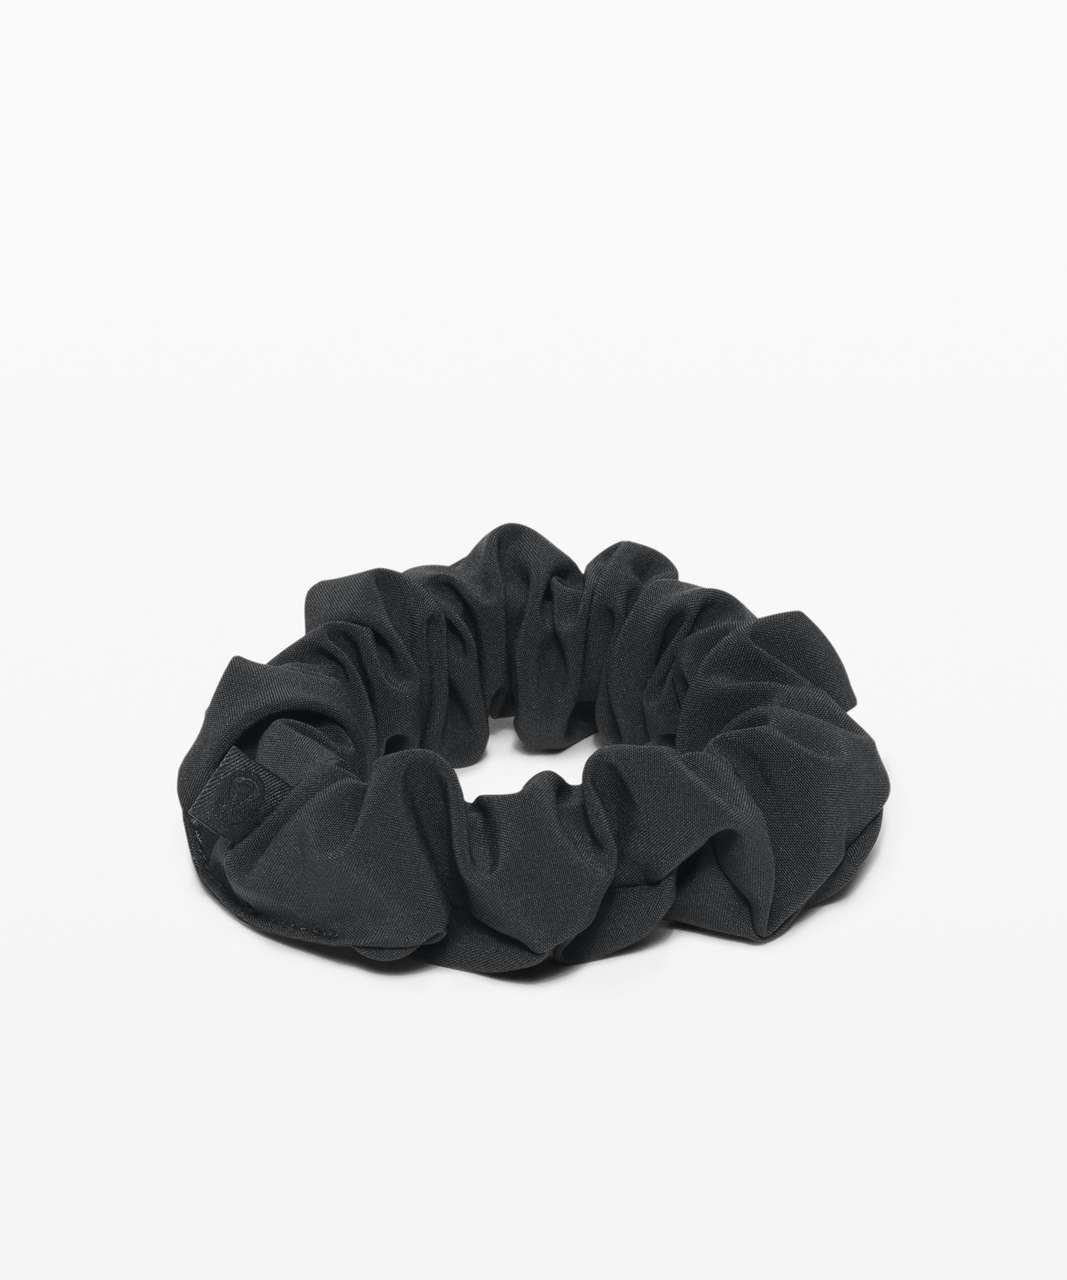 Lululemon Uplifting Scrunchie - Melanite